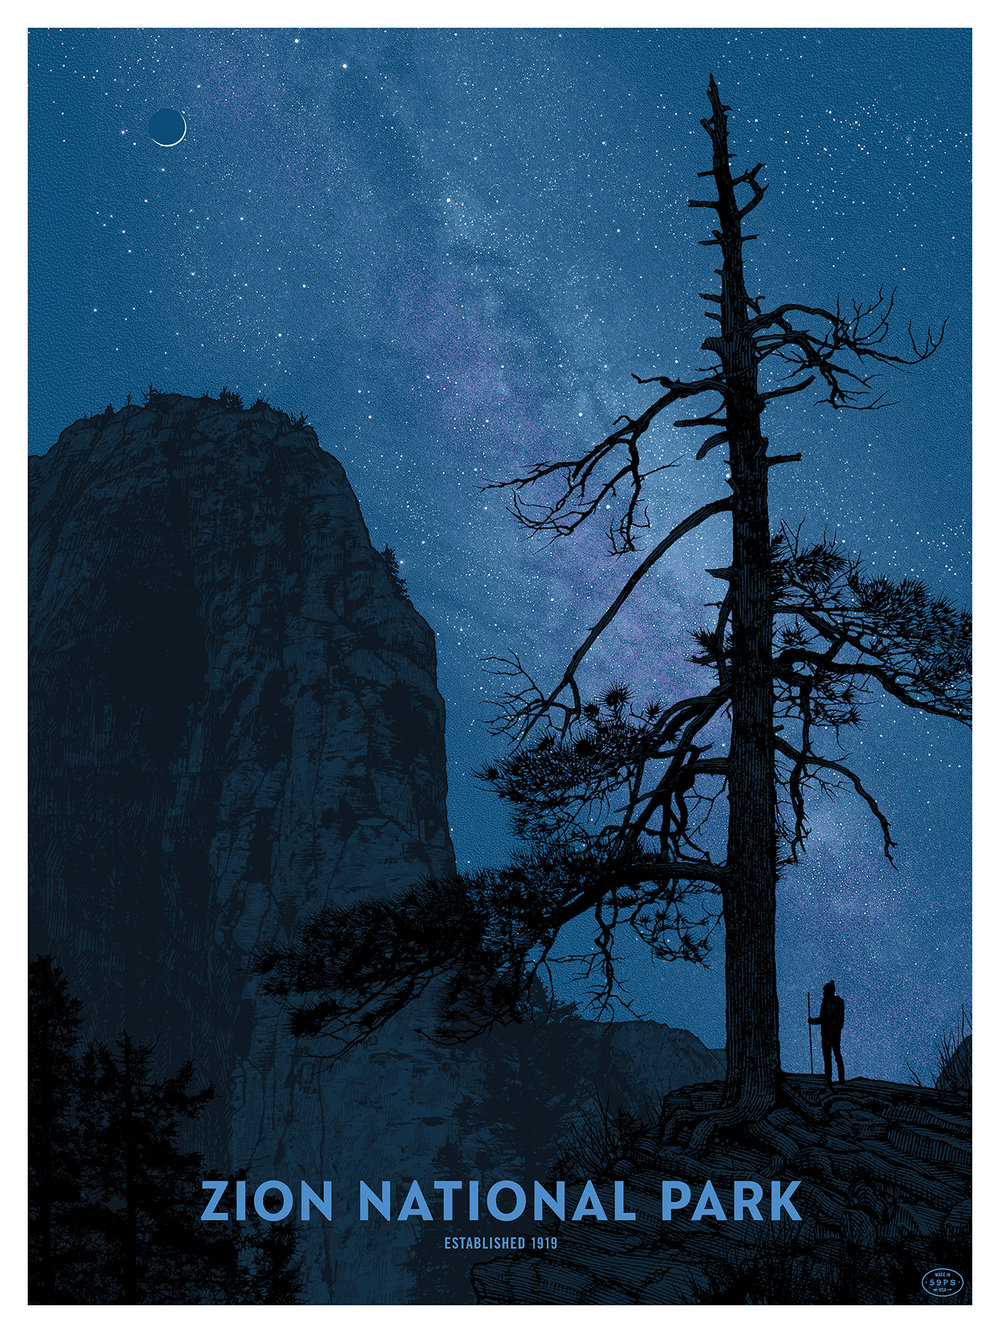 Zion-National-Park-Dan-McCarthy-Fifty-Nine-Parks-Print-Series_rgb.jpg